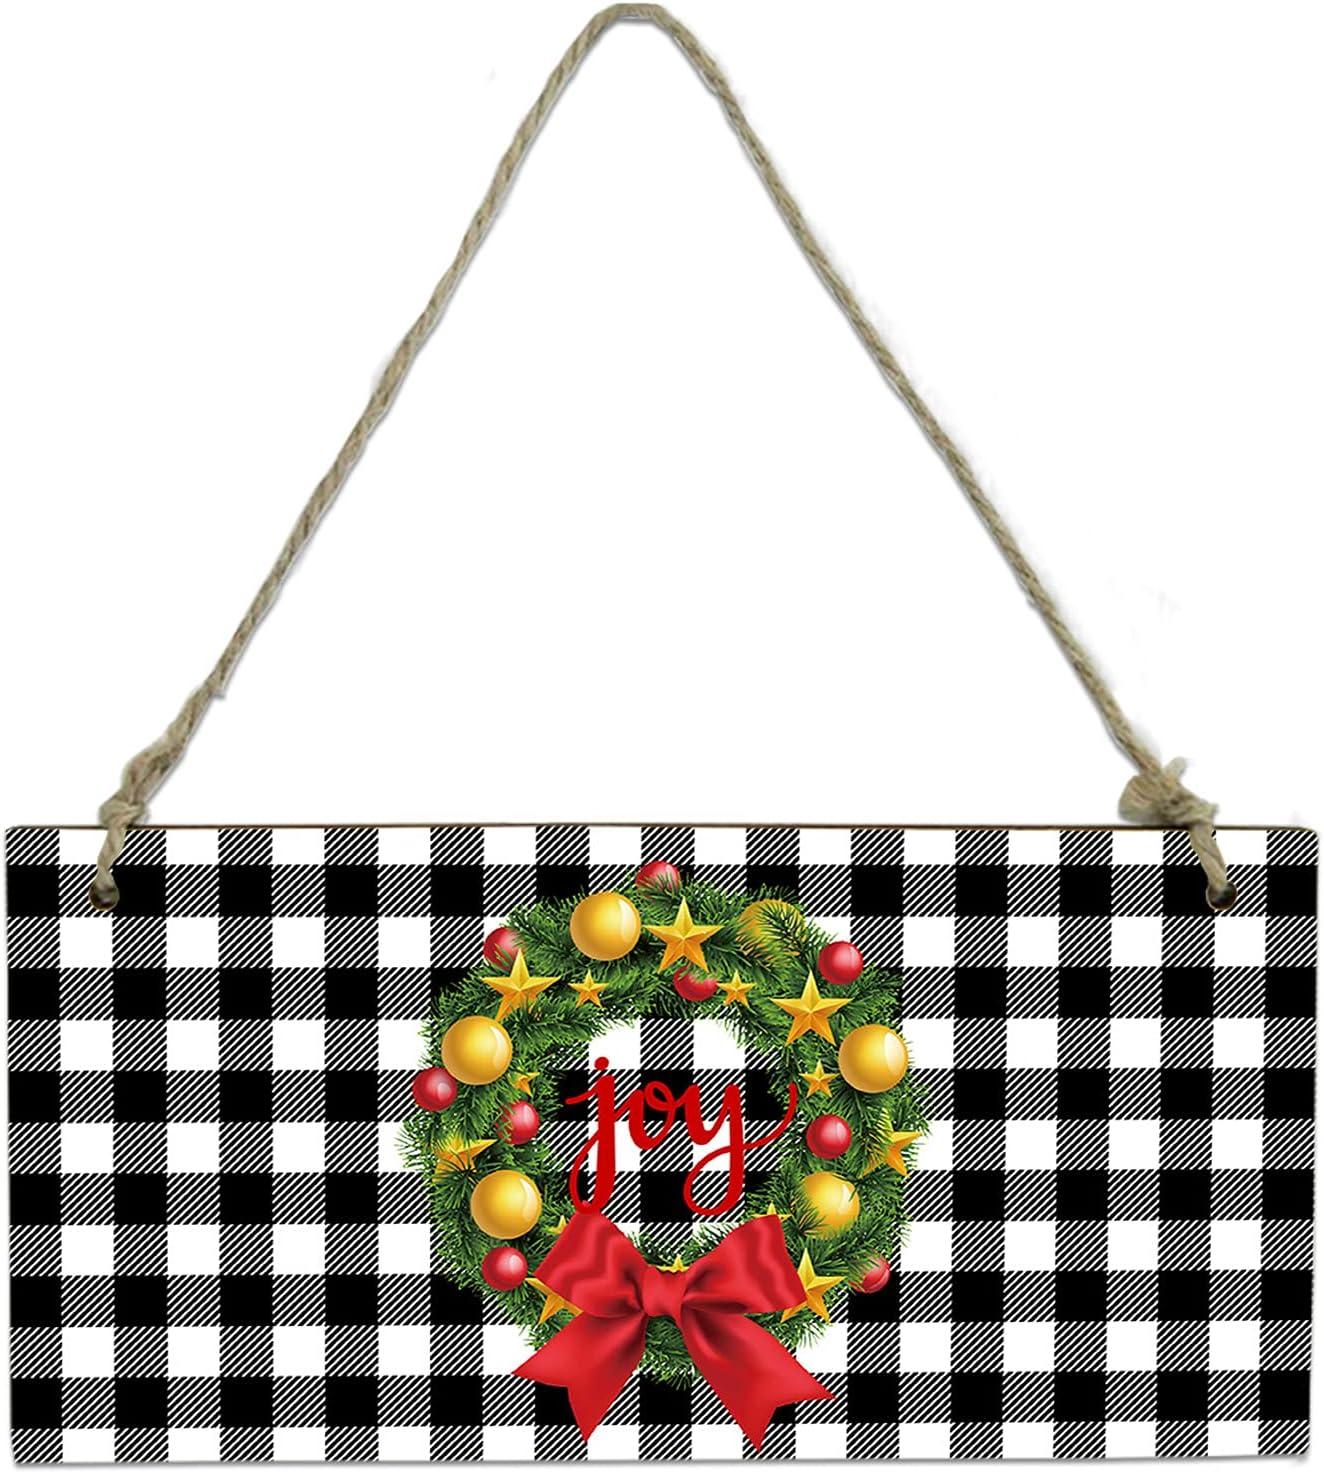 Ranking TOP20 LEOKOTI Christmas Farm Joy Wreath Hanging Wall for Sign Do New arrival Board